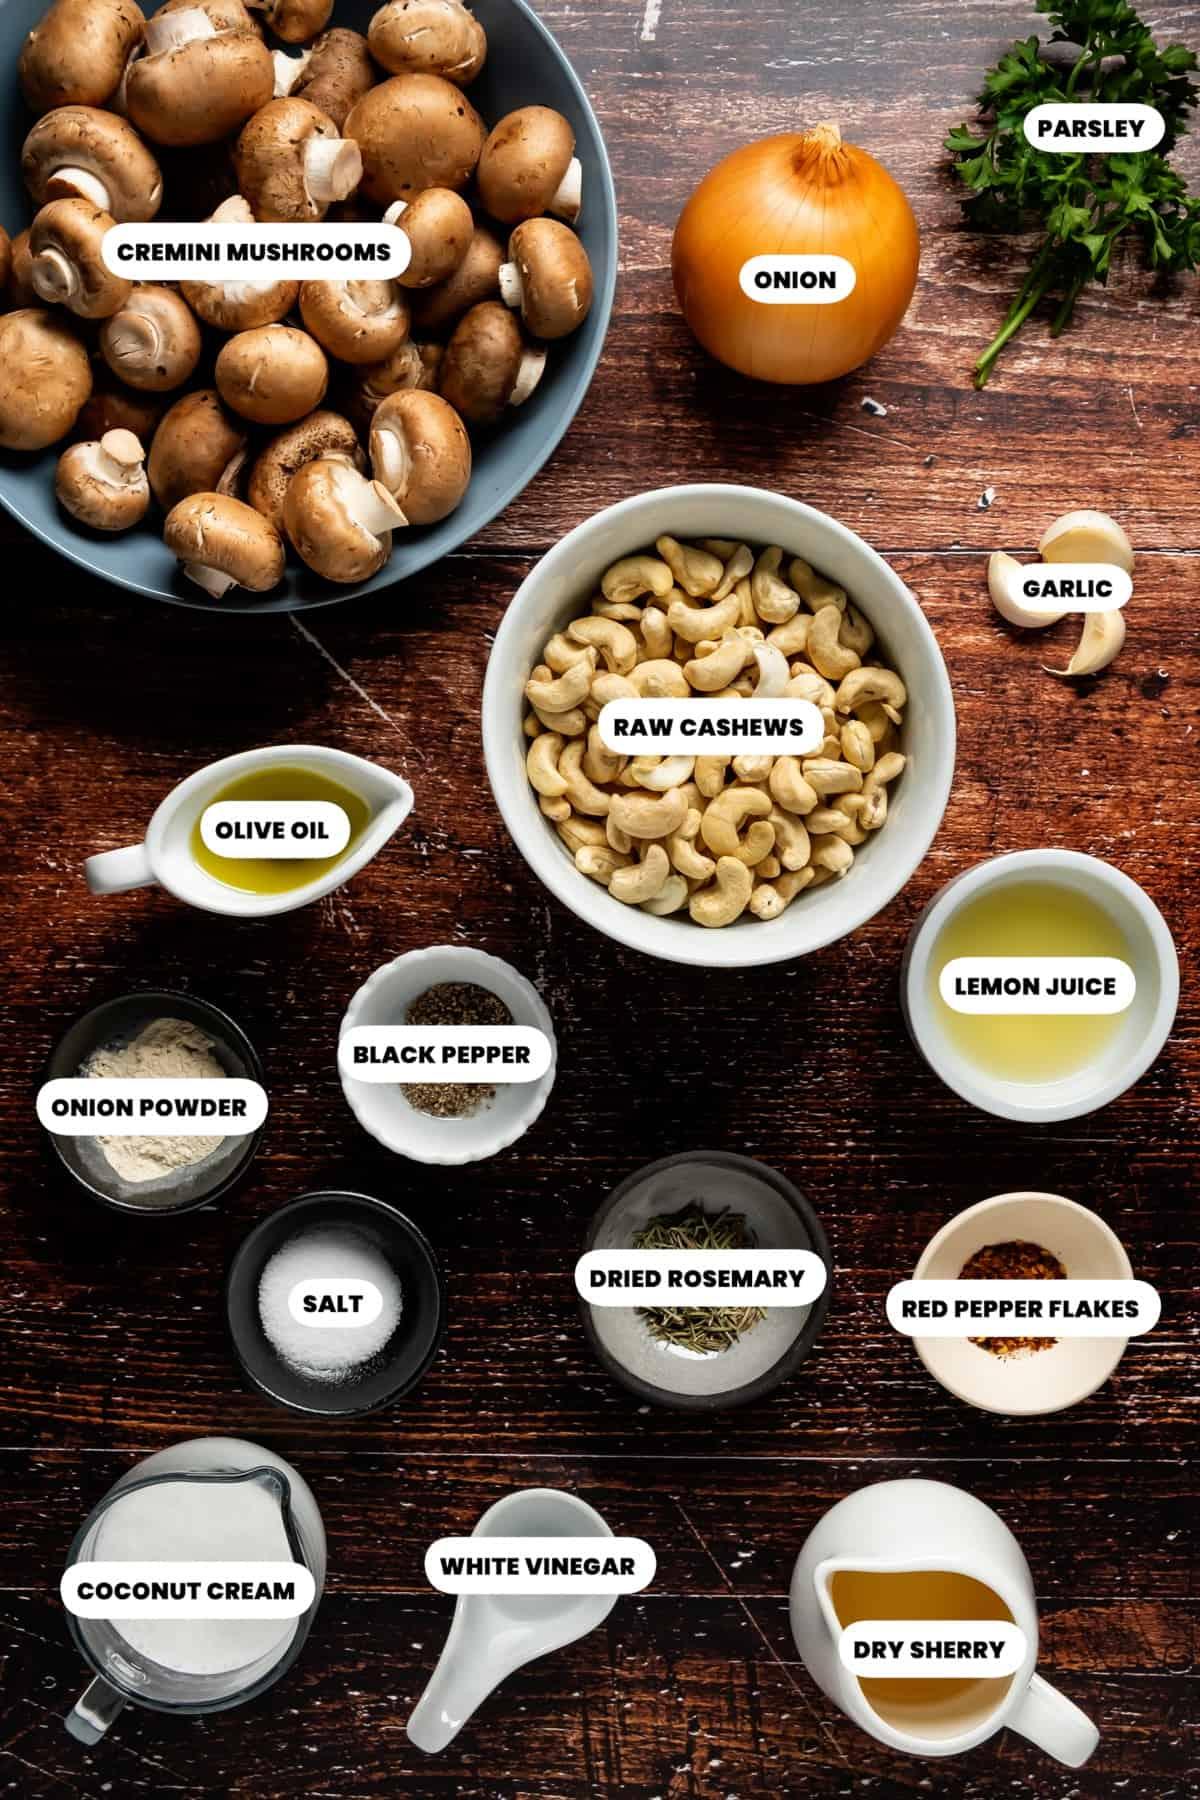 Photo of the ingredients needed to make vegan mushroom pâté